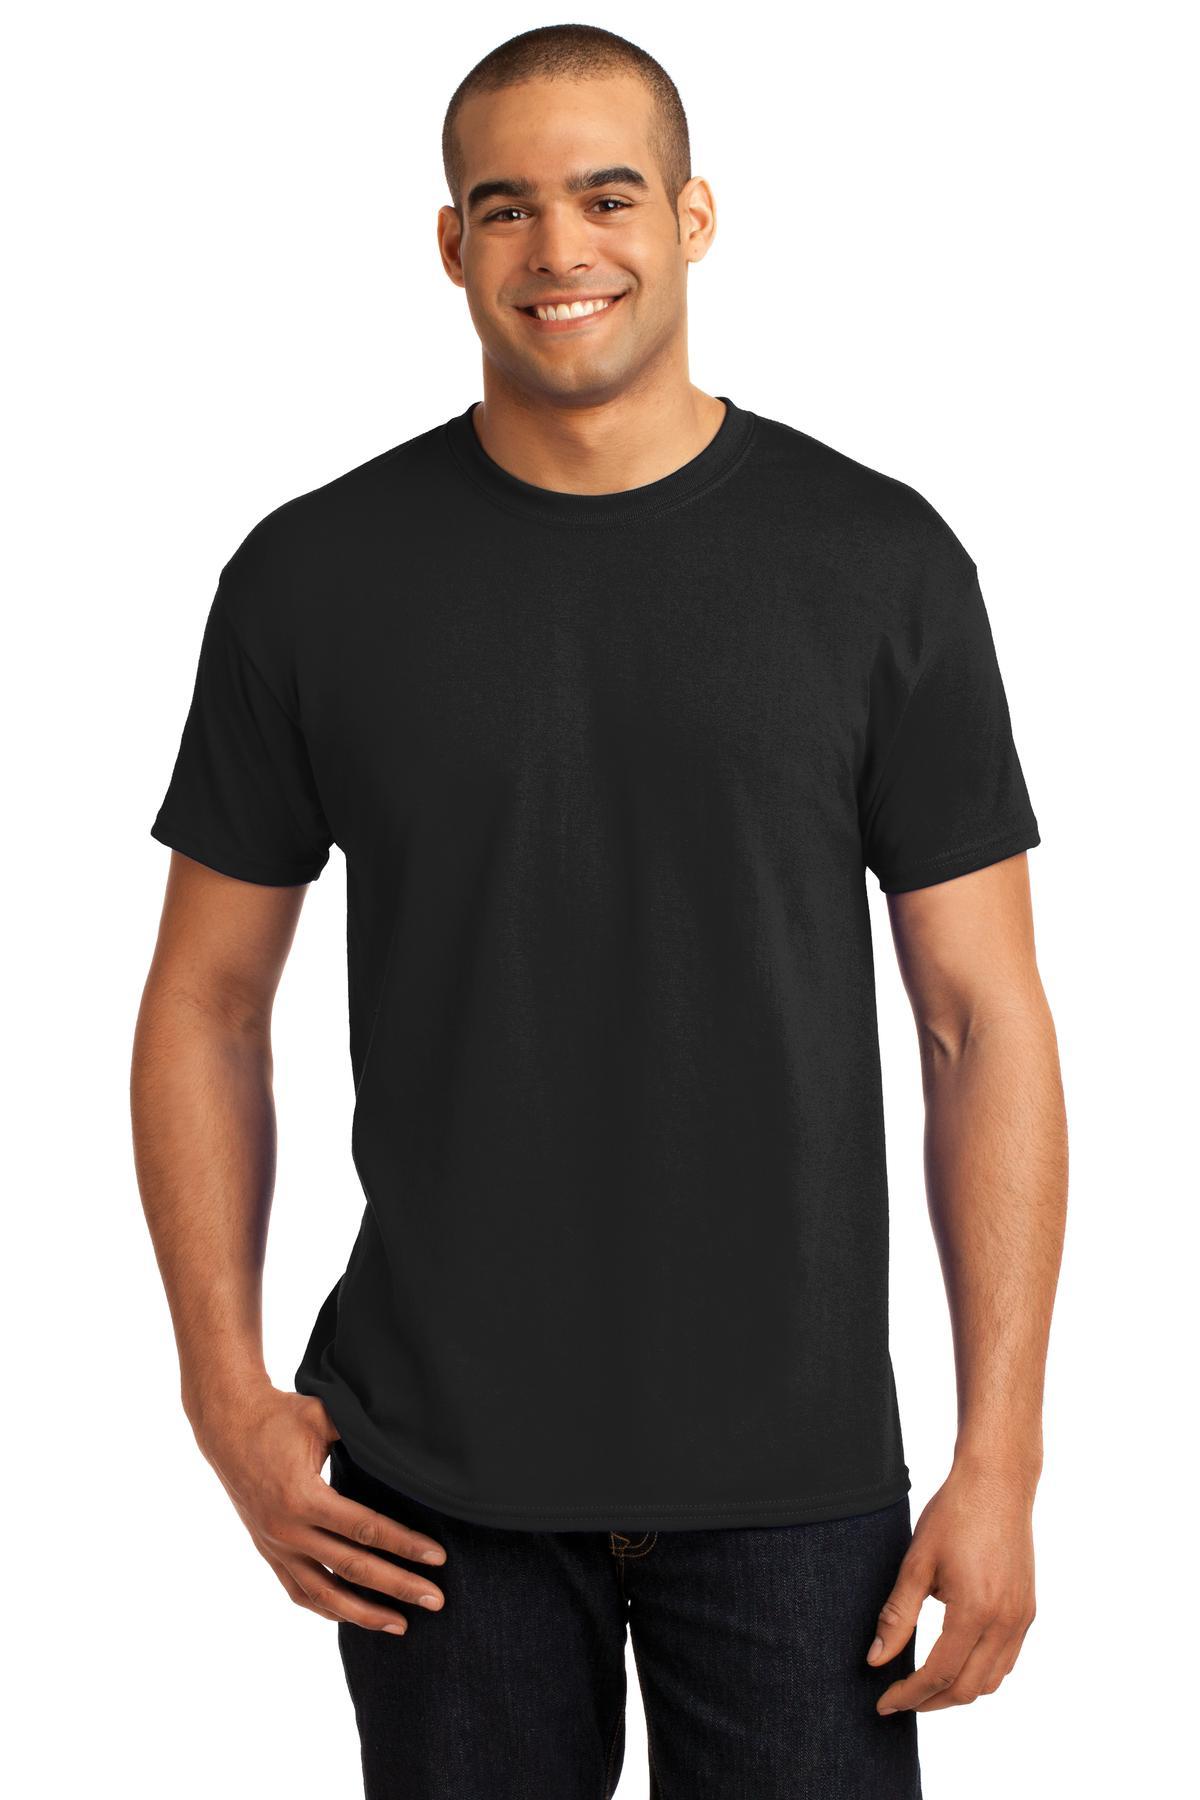 Hanes EcoSmart 50/50 Cotton/Poly T-Shirt